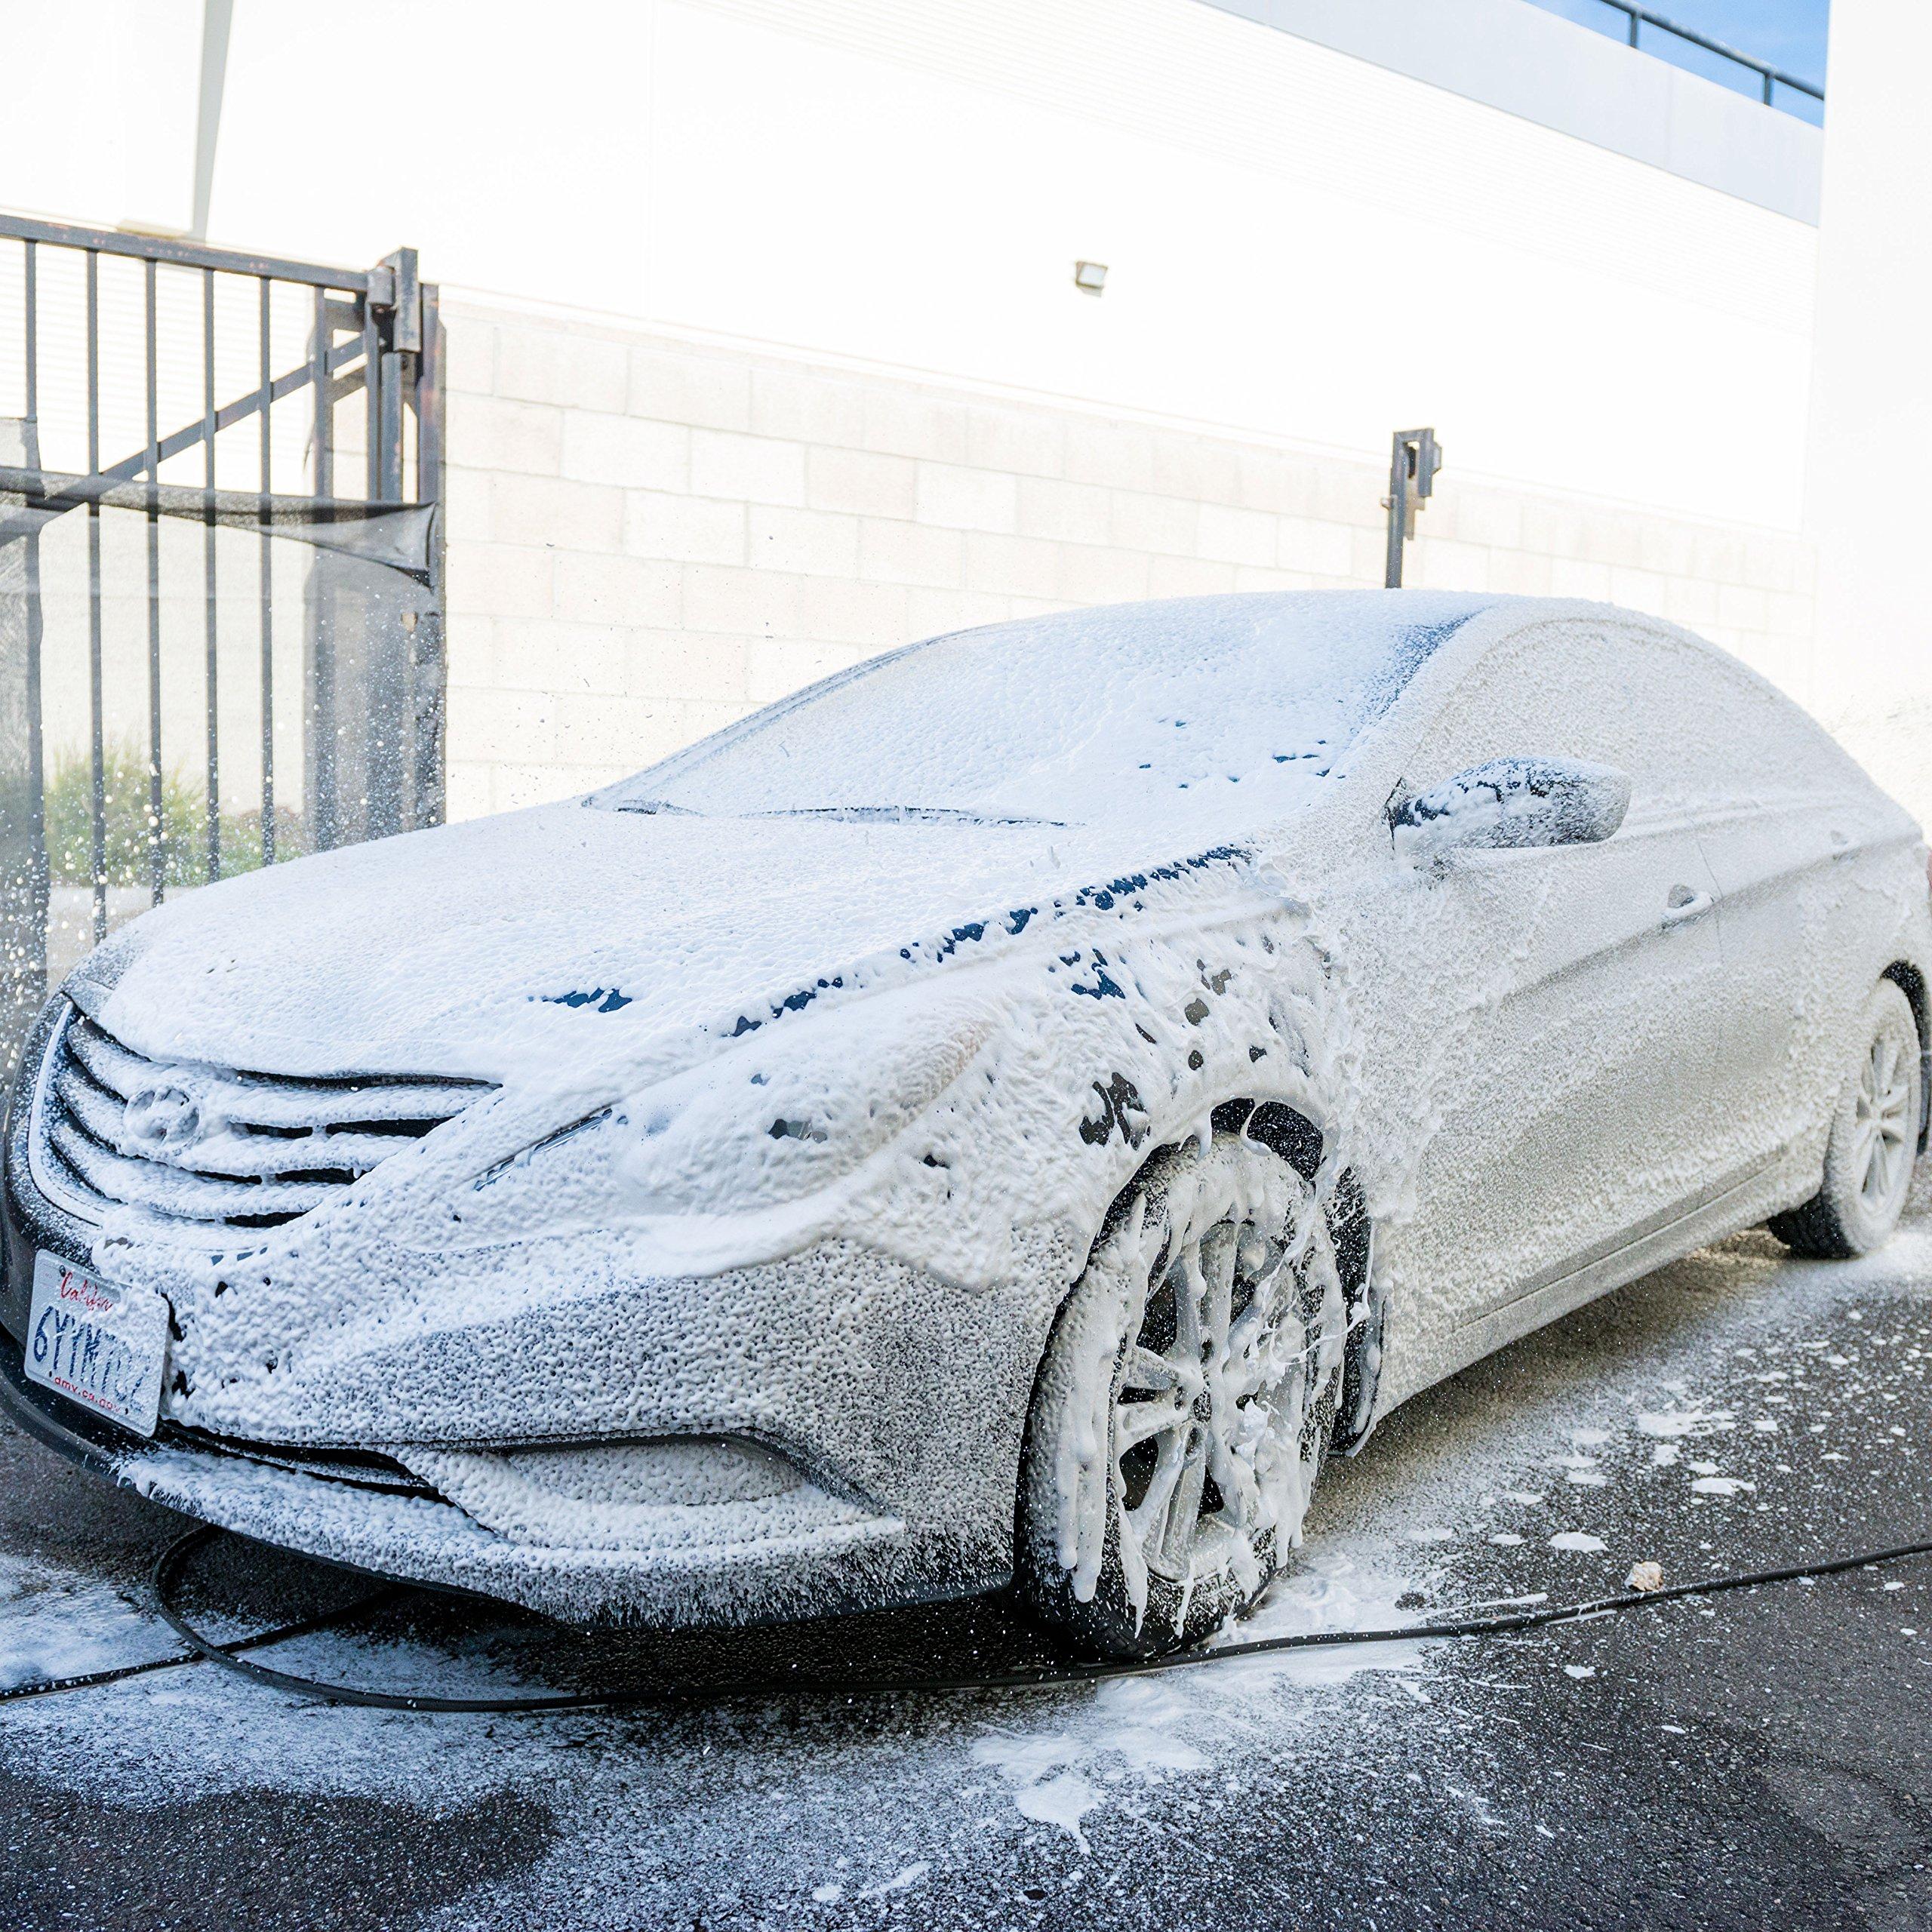 Chemical Guys CWS61964 Black Light Hybrid Radiant Finish Car Wash Soap (64 oz - 1/2 Gallon) by Chemical Guys (Image #5)